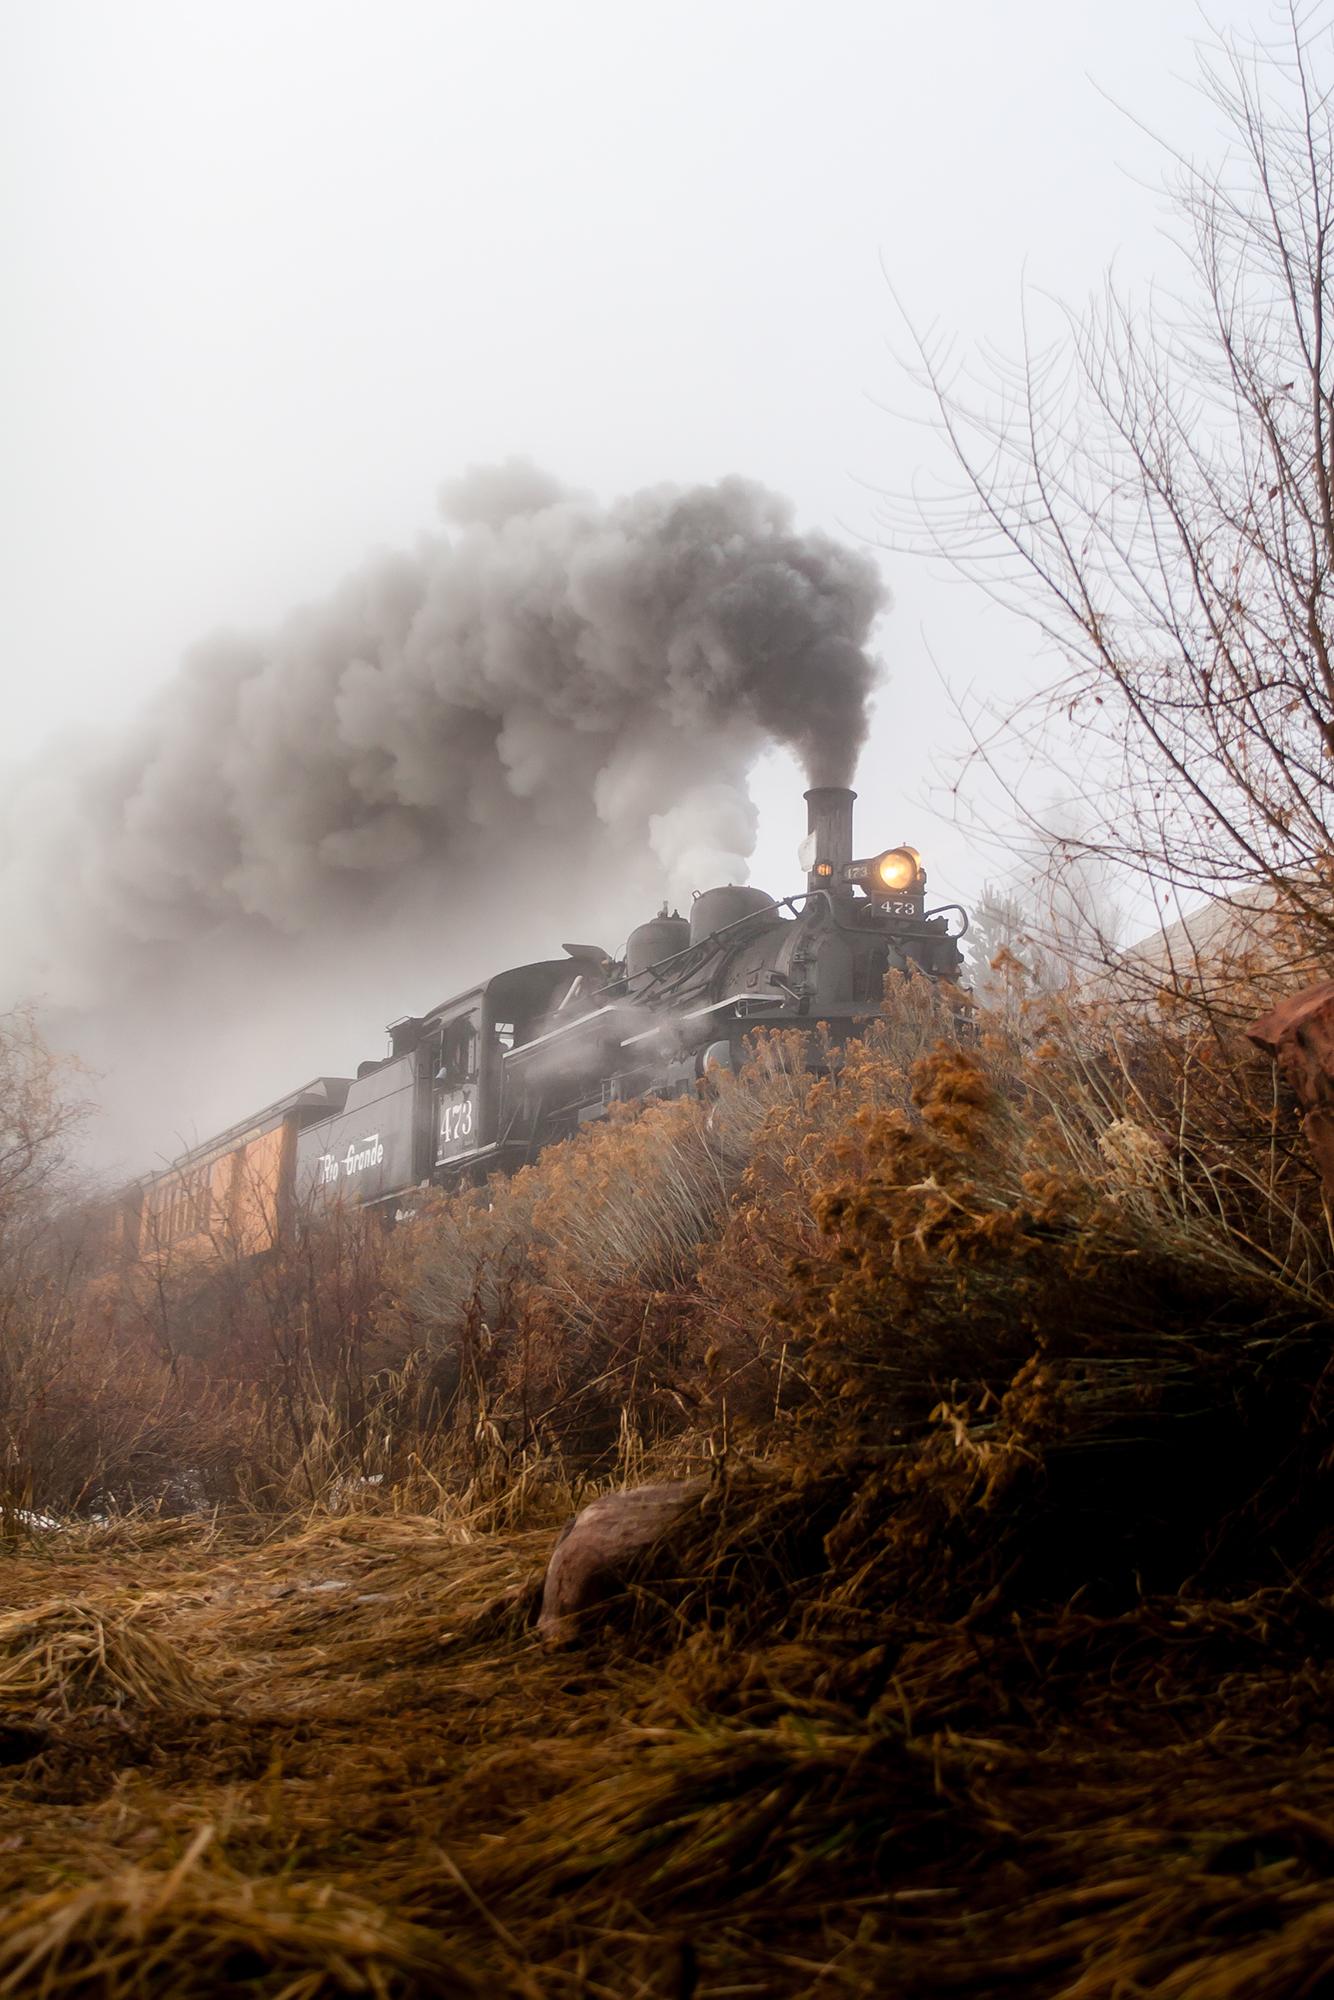 Photograph of Durango Silver Narrow Gauge Railroad train engine in Durango Colorado